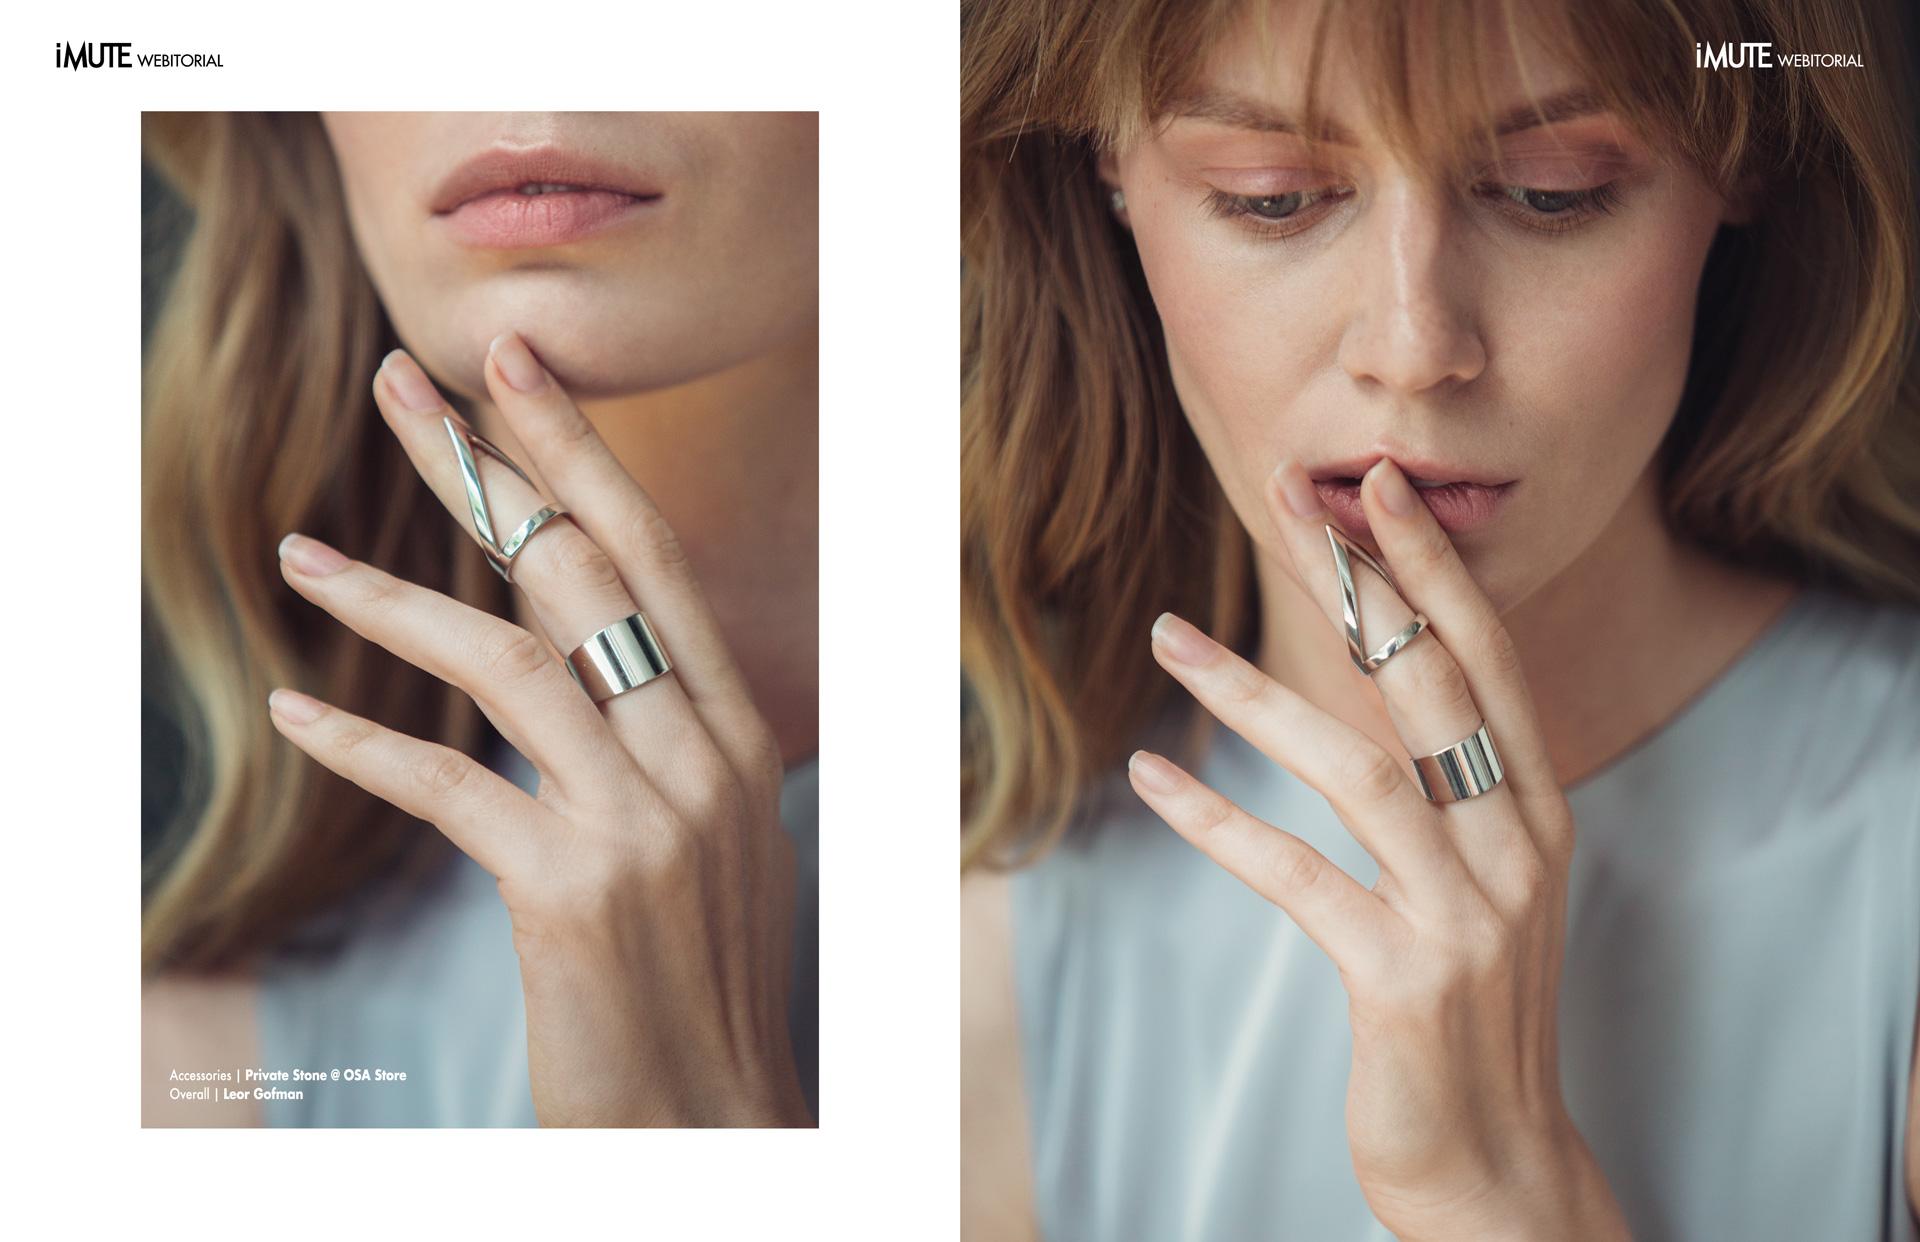 White Shadows webitorial for iMute Magazine Photographer|Hanna Кabanova Model| Vita Burak @TFM Stylist|Anastasia Mamaeva Makeup|Zhanna Parahnevich Hair| Olga Sashina